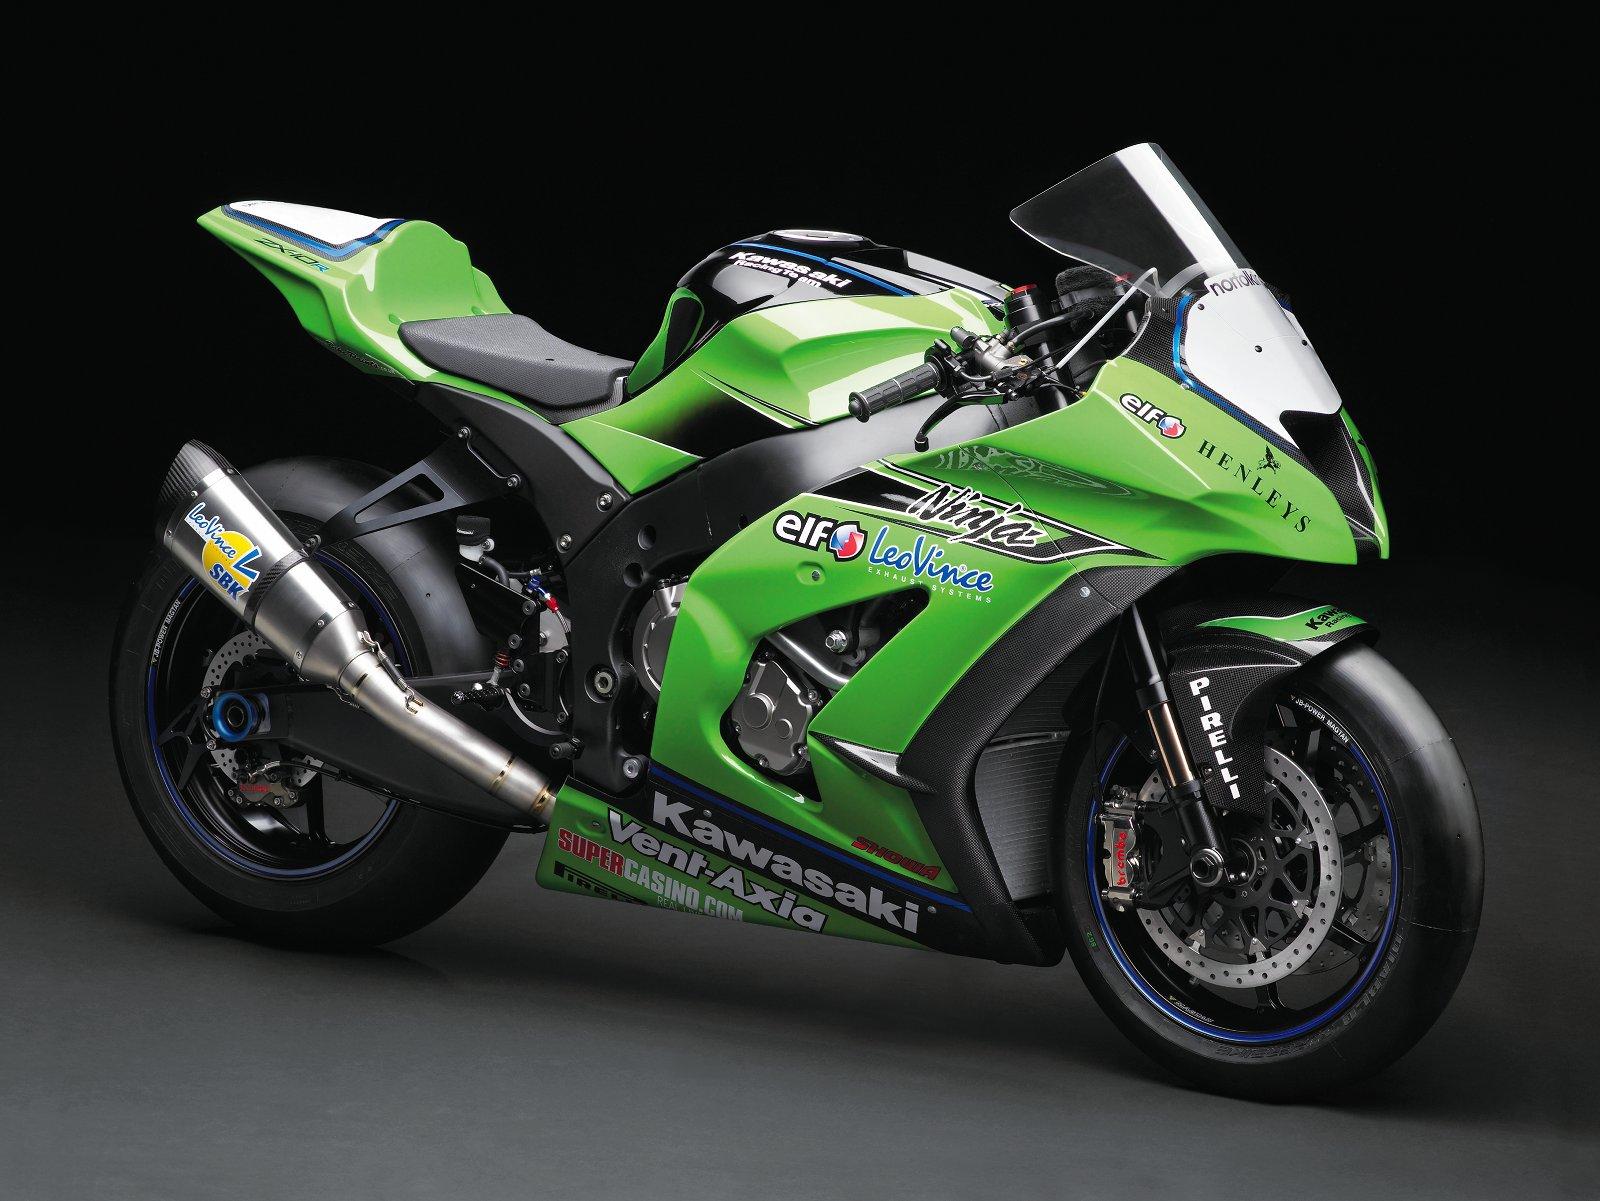 Ninja R Modifikasi Youtube Motor Kawasaki Modifikasi Modifikasi